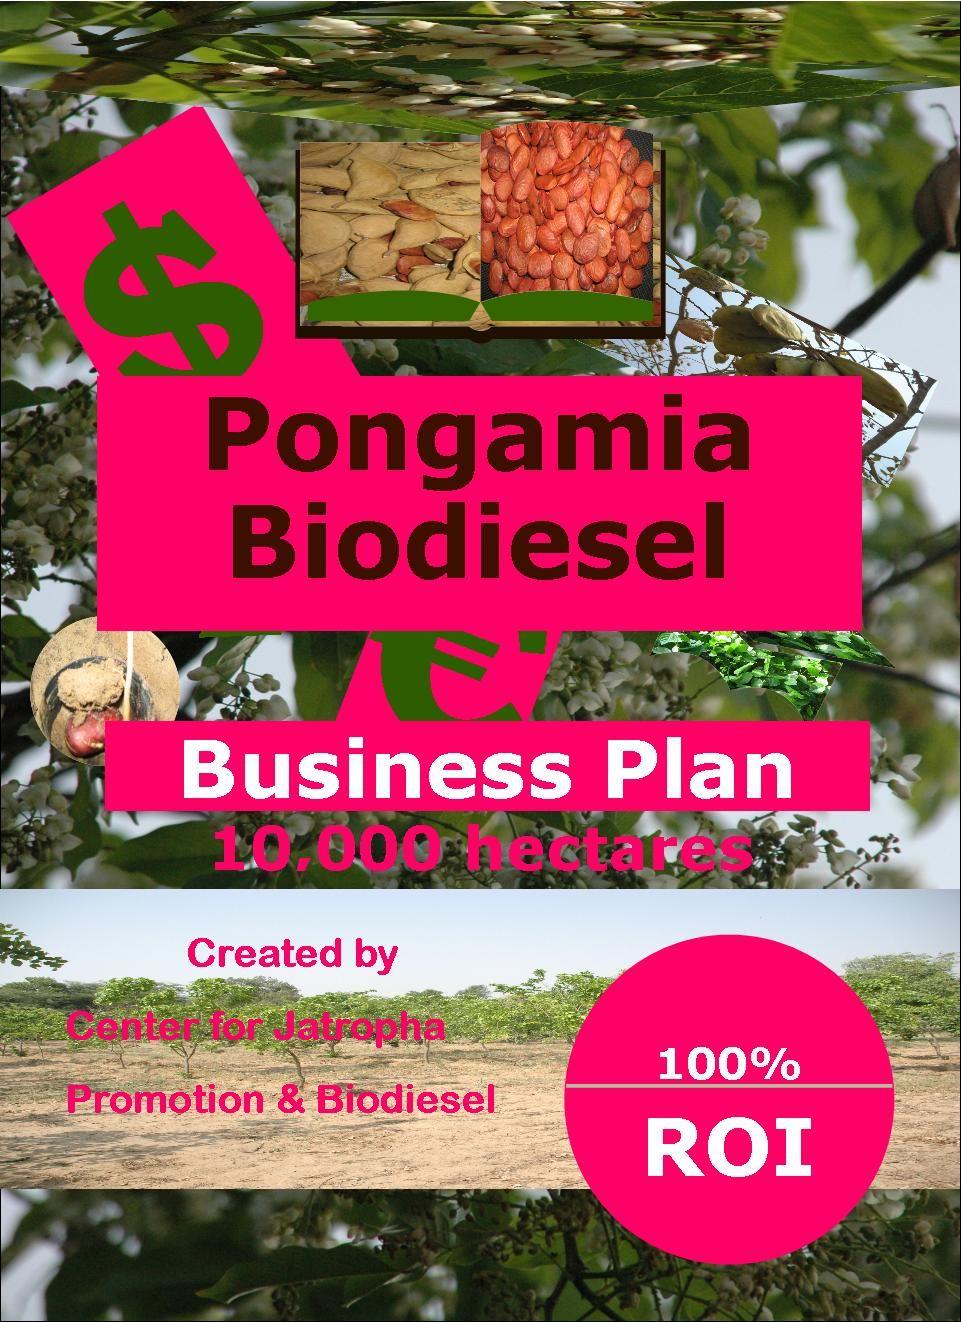 moringa business plan 100 ha biodiesel business plans